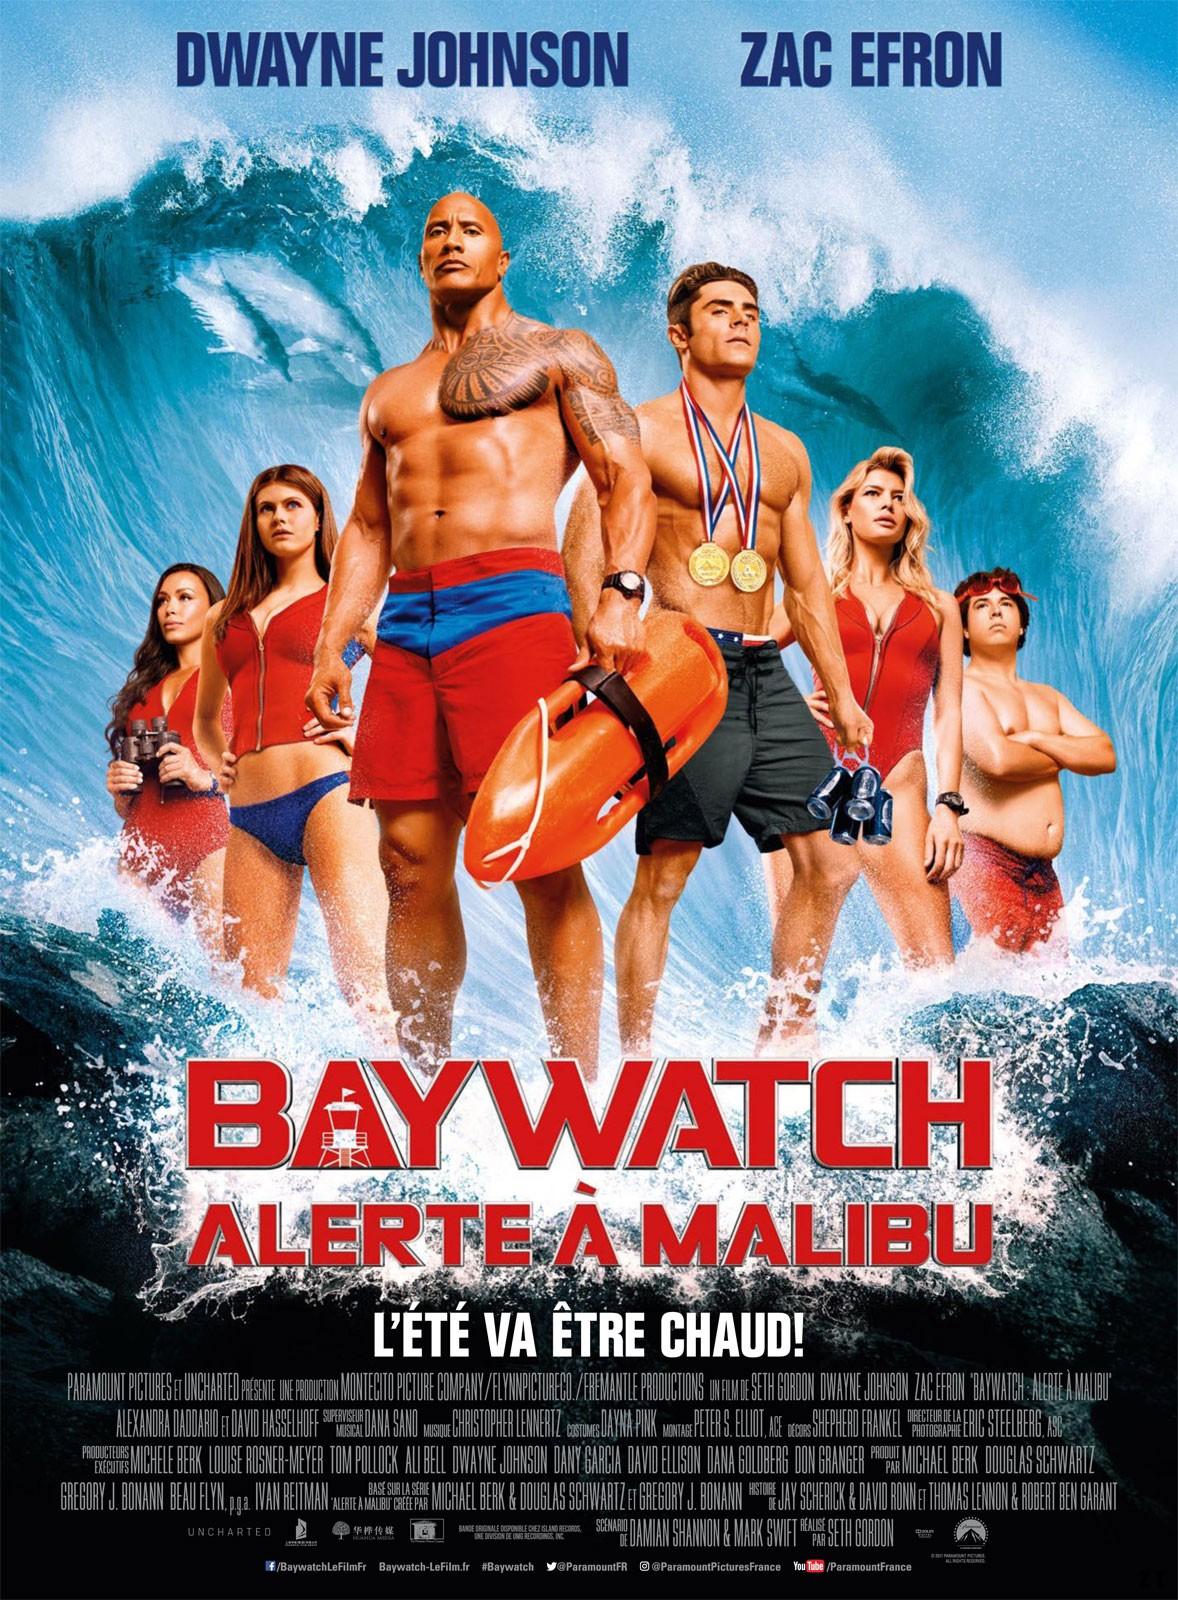 Baywatch - Alerte à Malibu FRENCH BluRay 1080p 2017